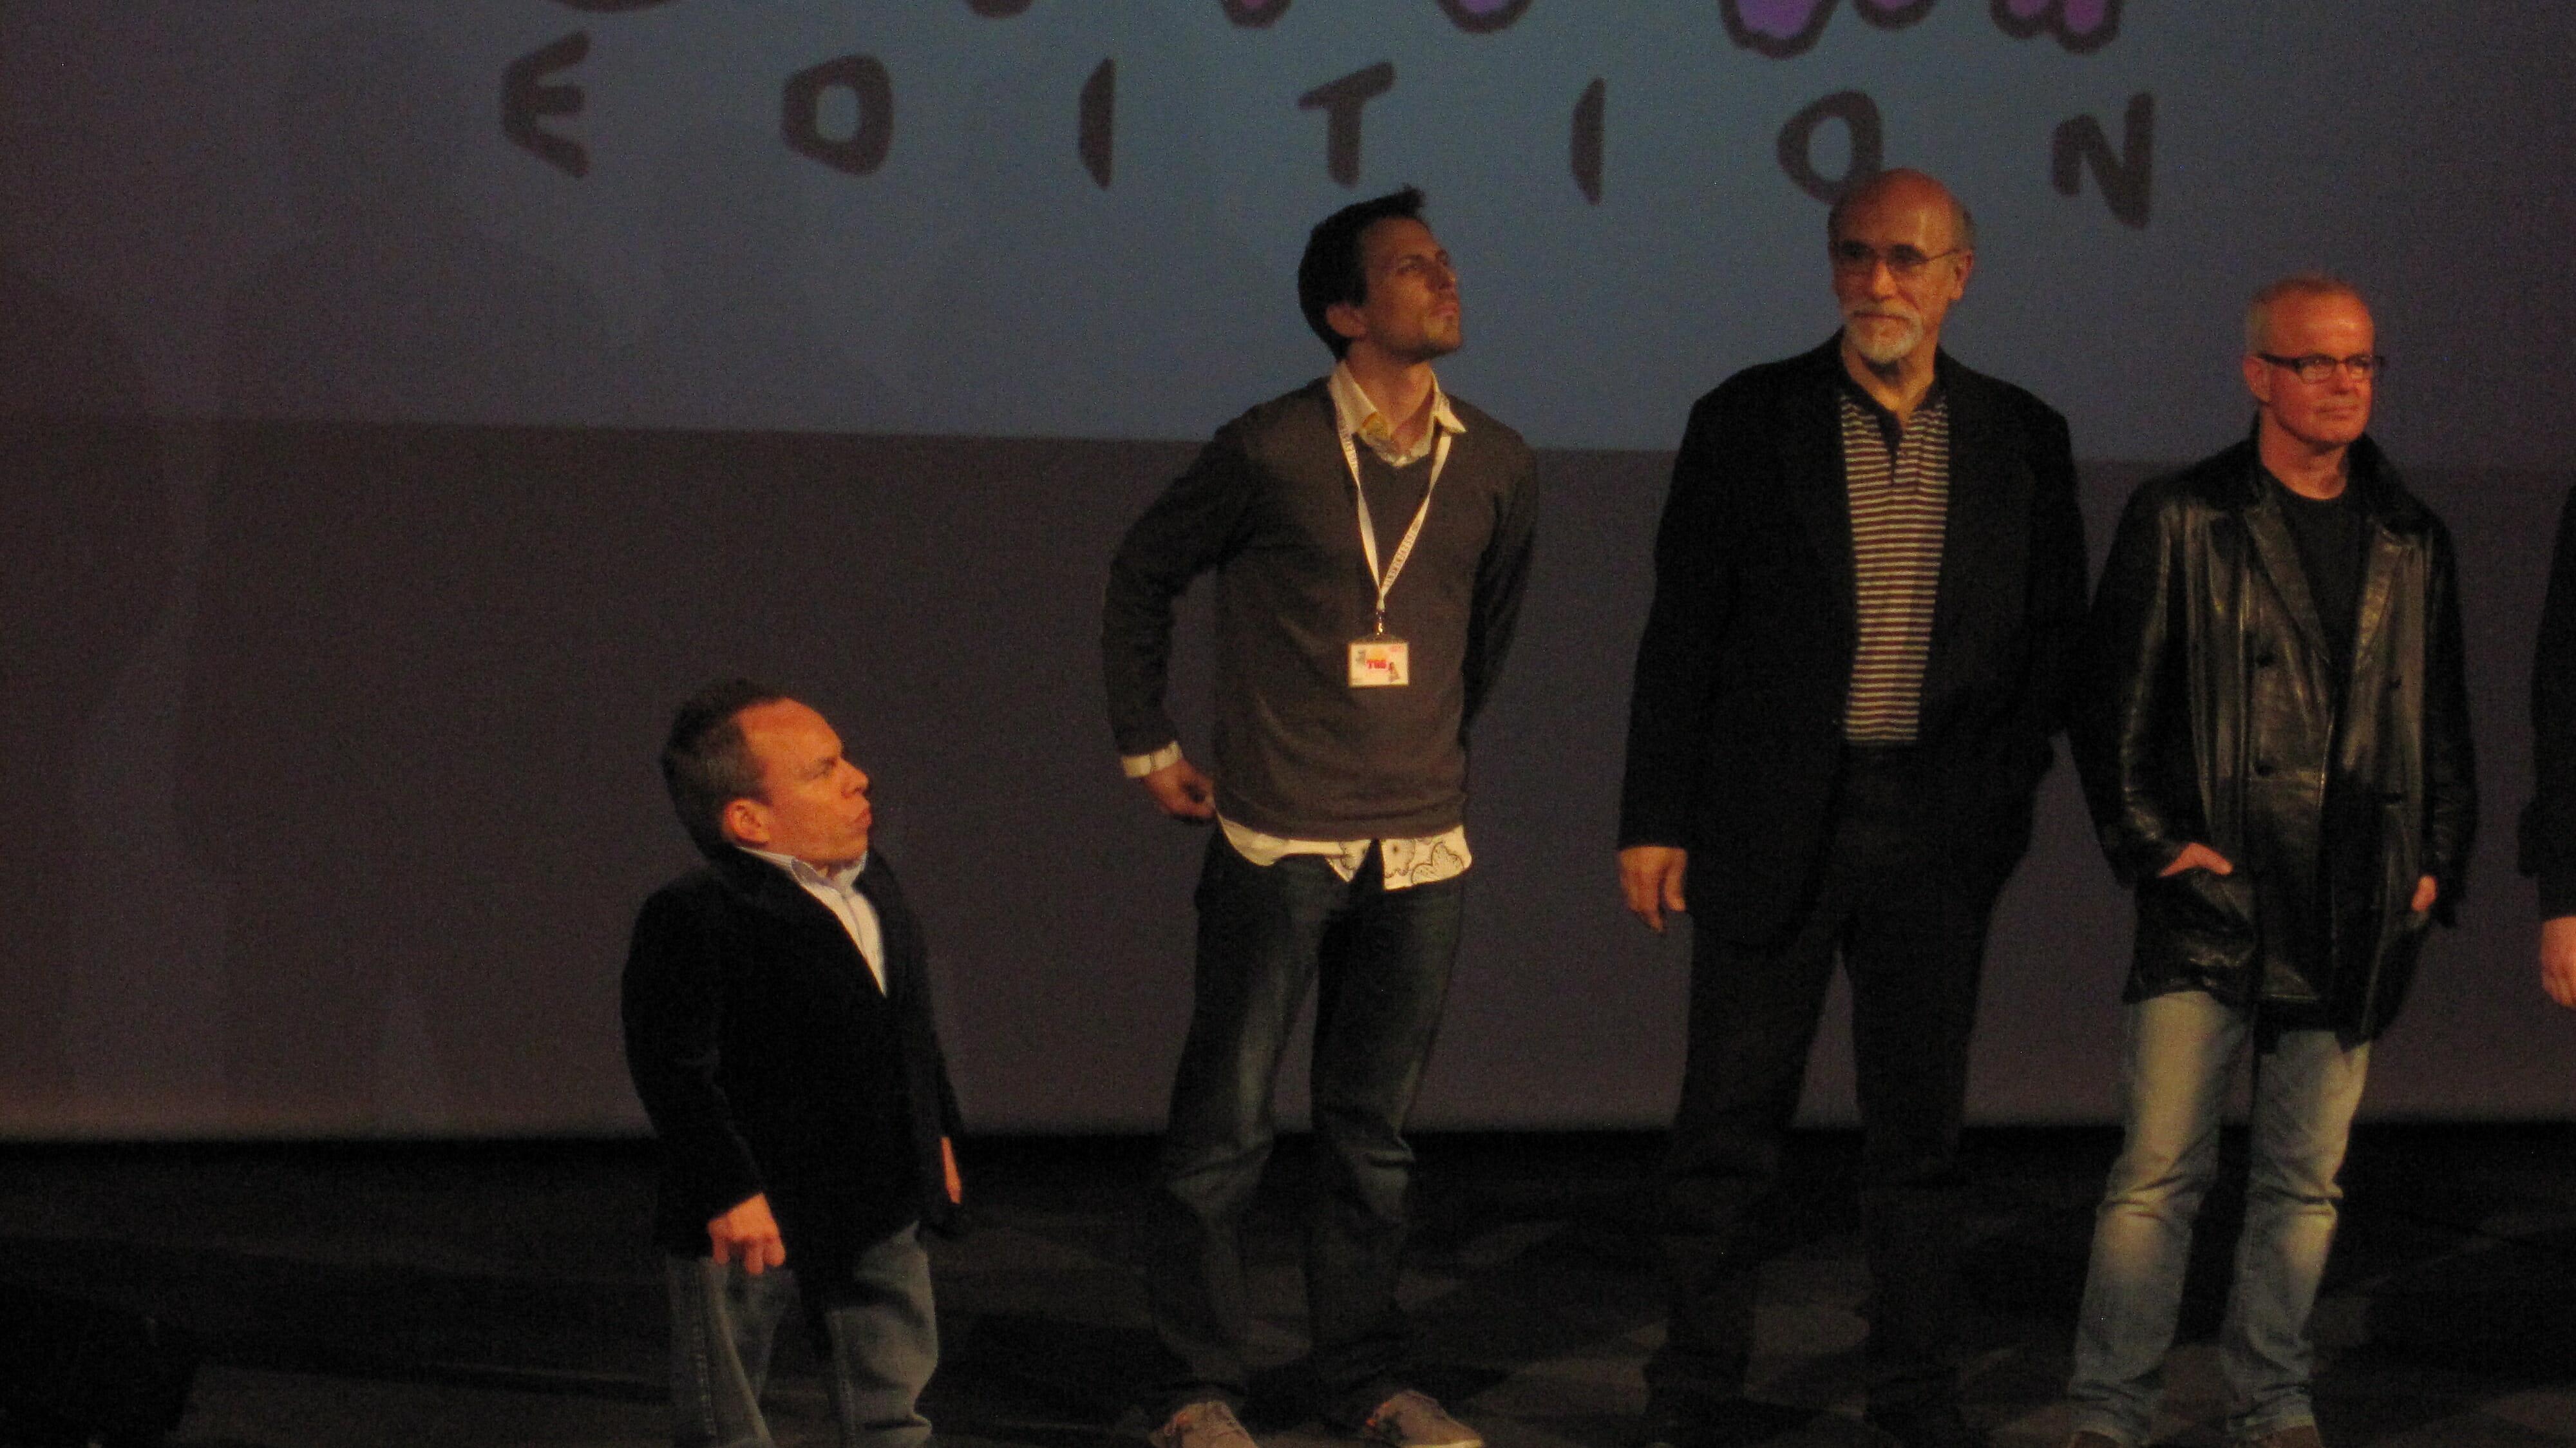 Warwick-Davis-Tony-Amendola et Gary Jones lors de l'inauguration